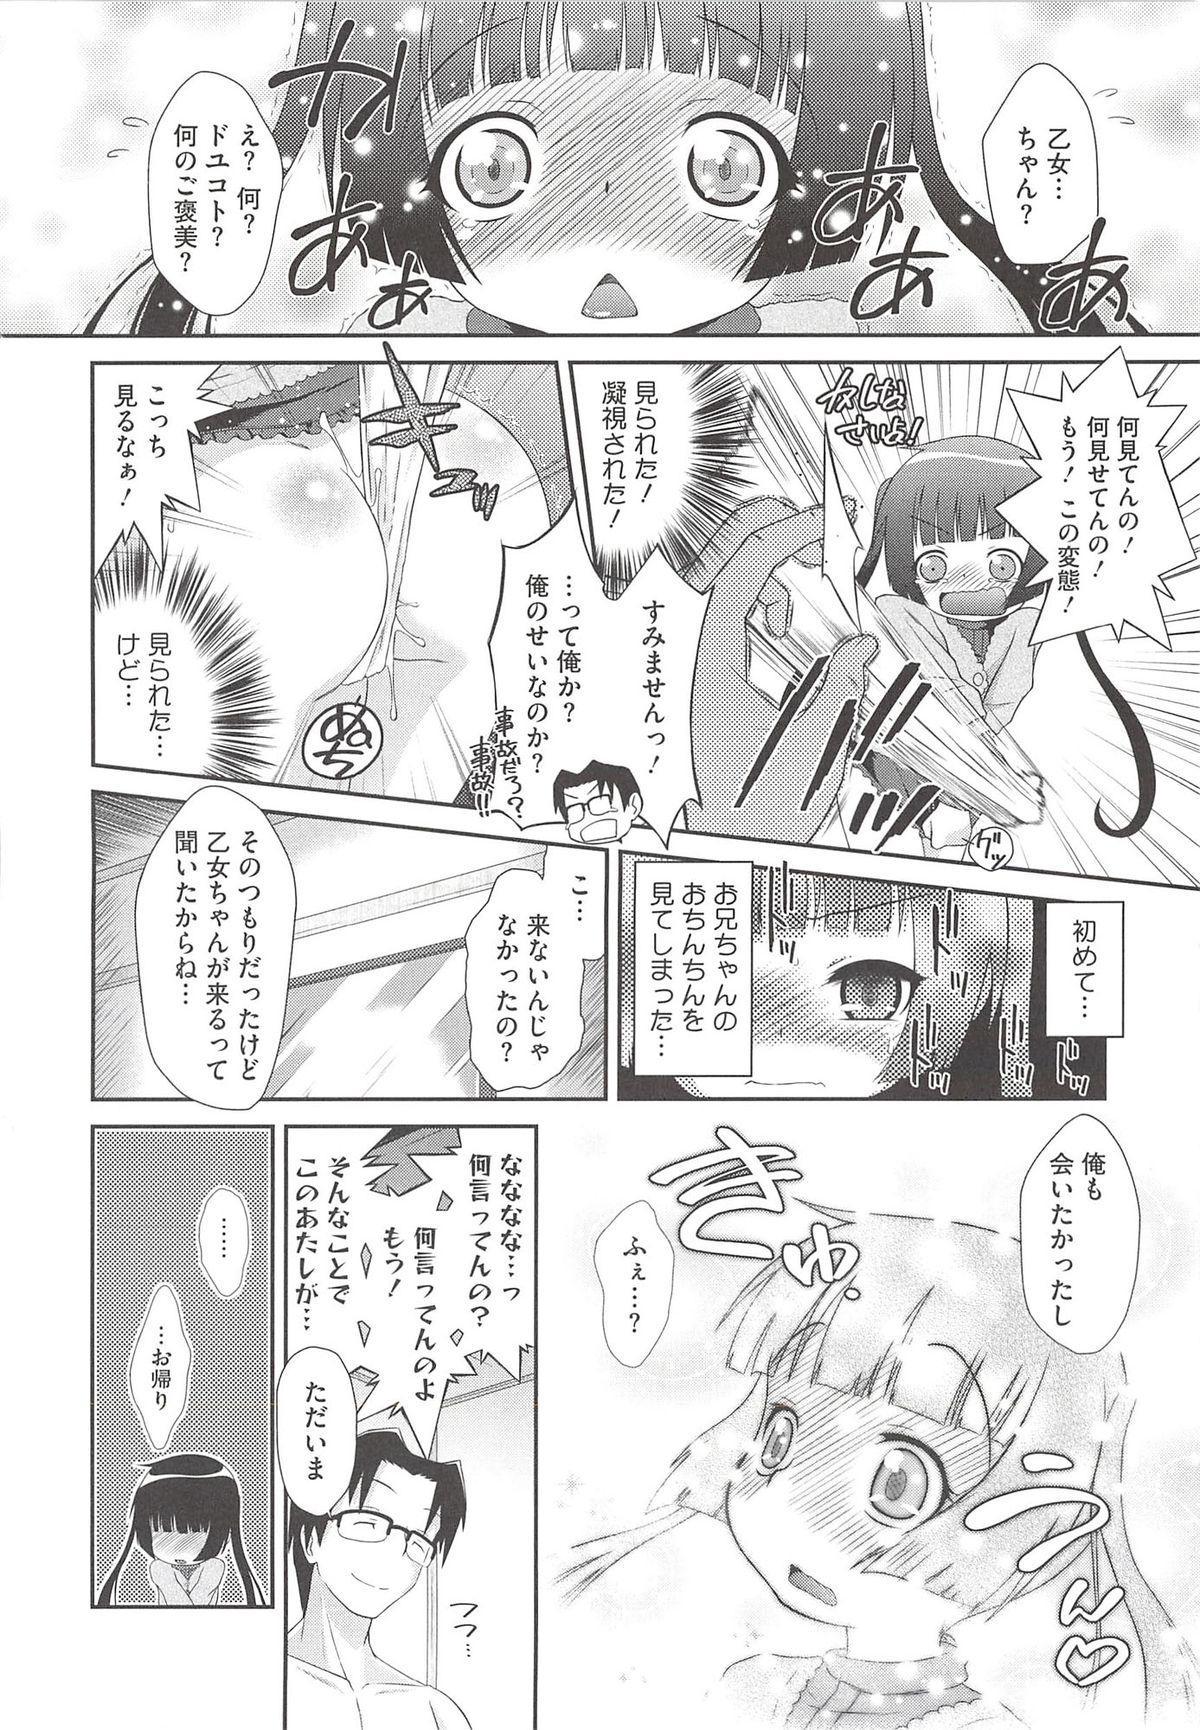 Itazura Time 9